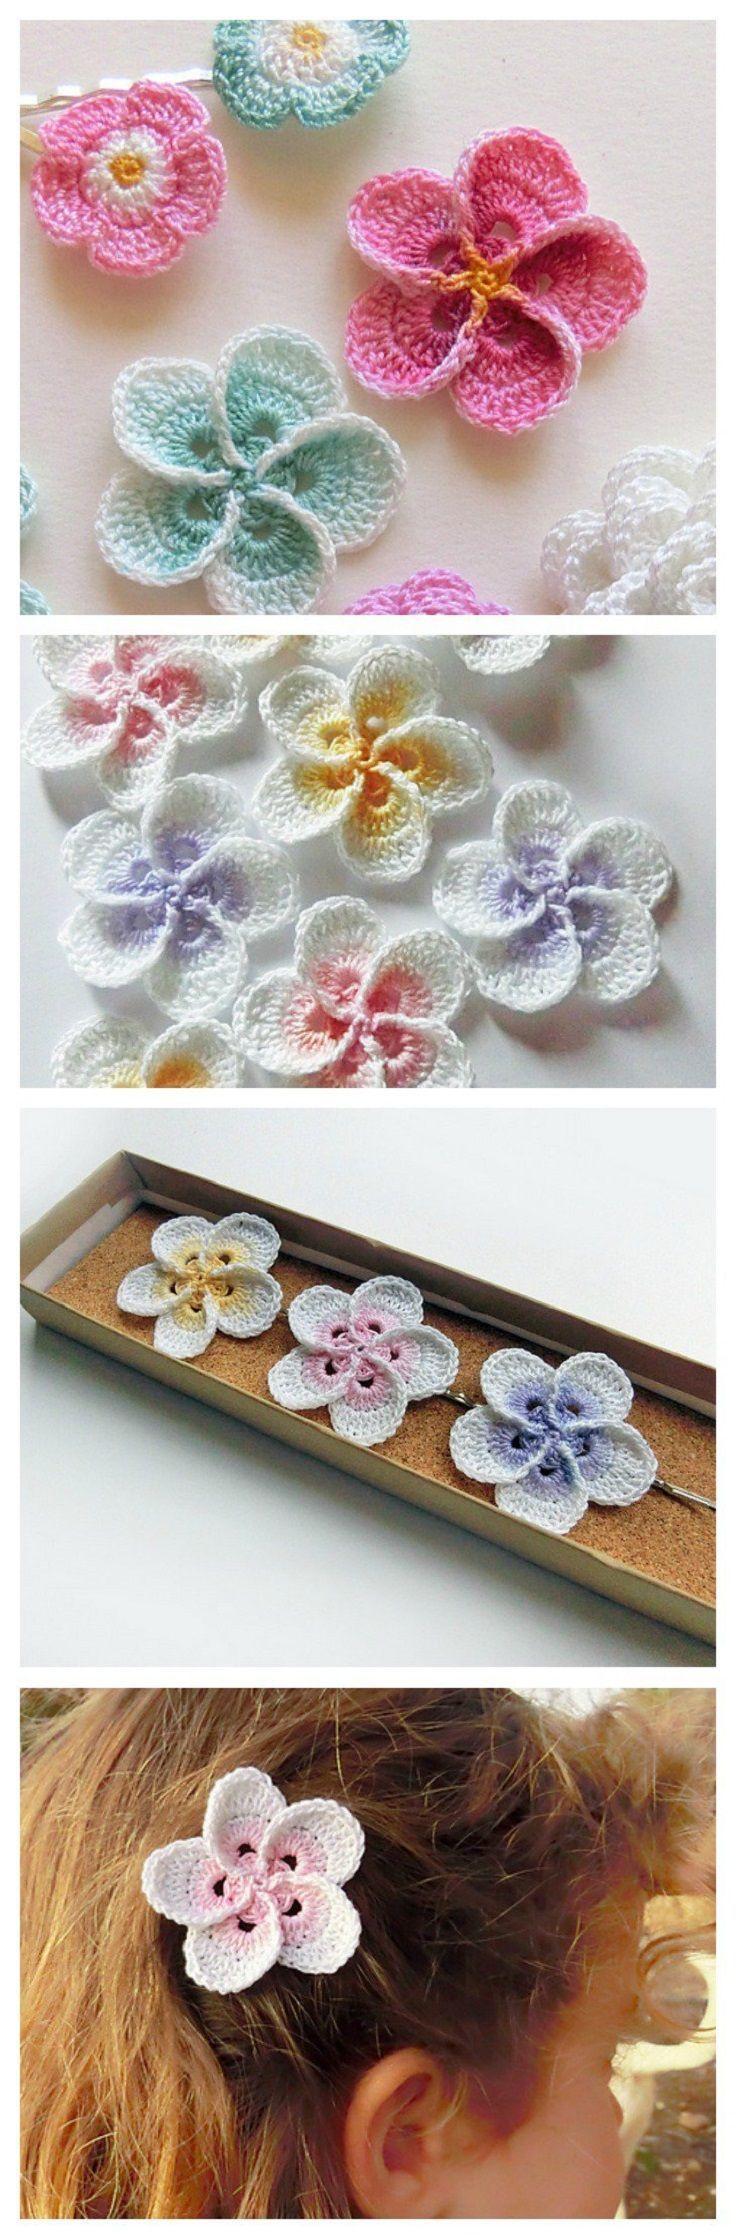 Hawaiian Plumeria Flower Free Crochet Pattern - 11 Easy and Simple ...